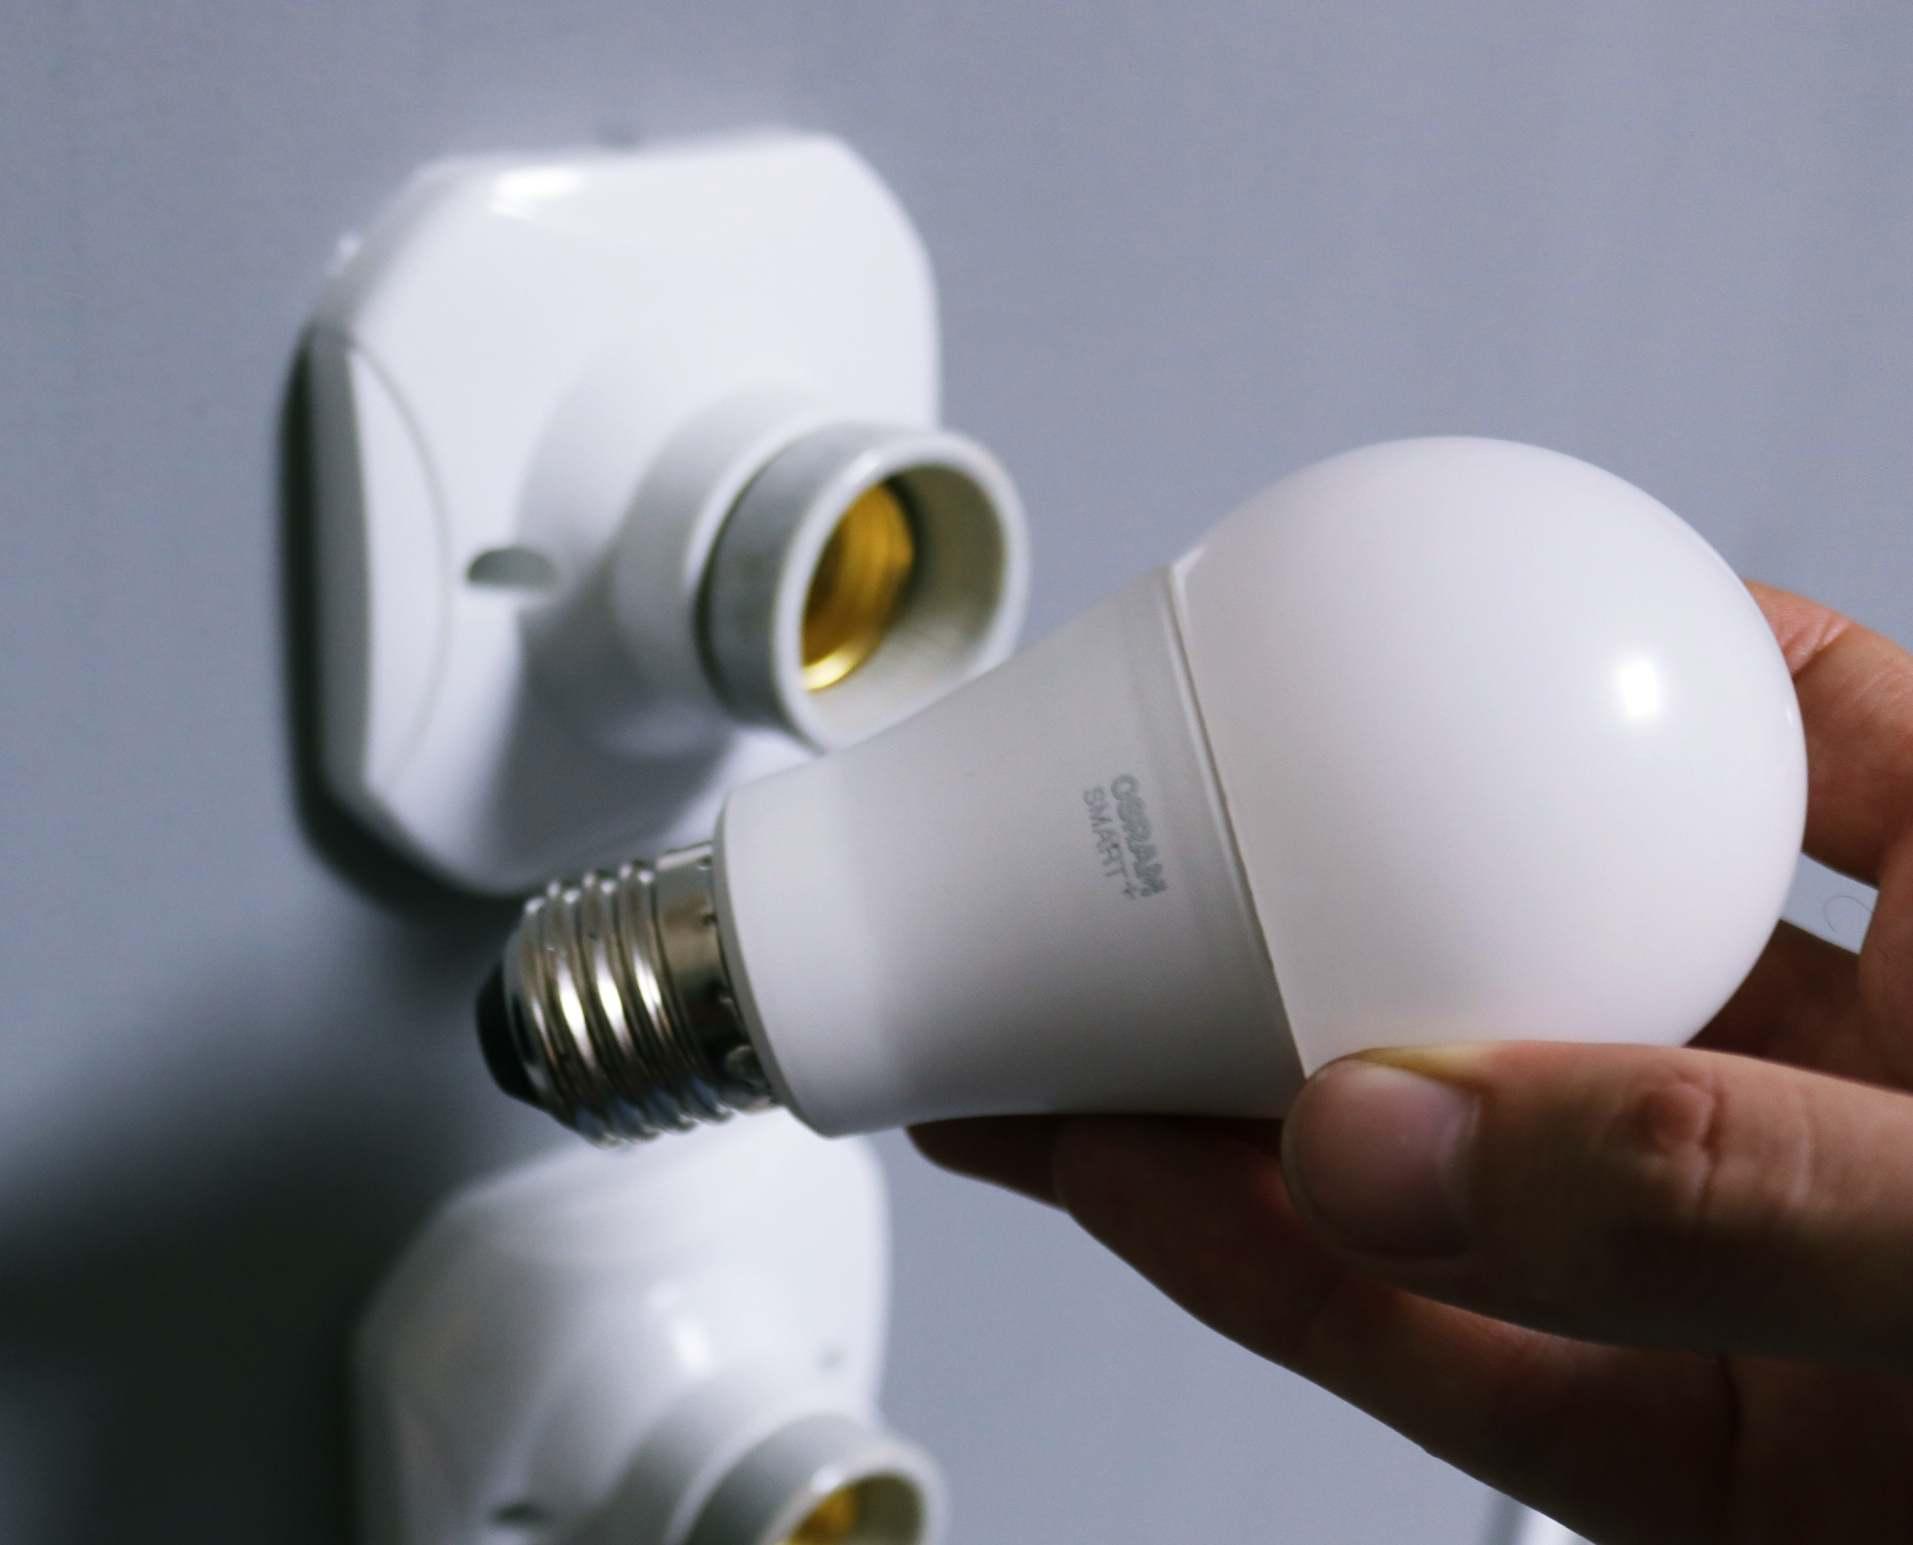 osram smart+ lampen mit philips hue verbinden